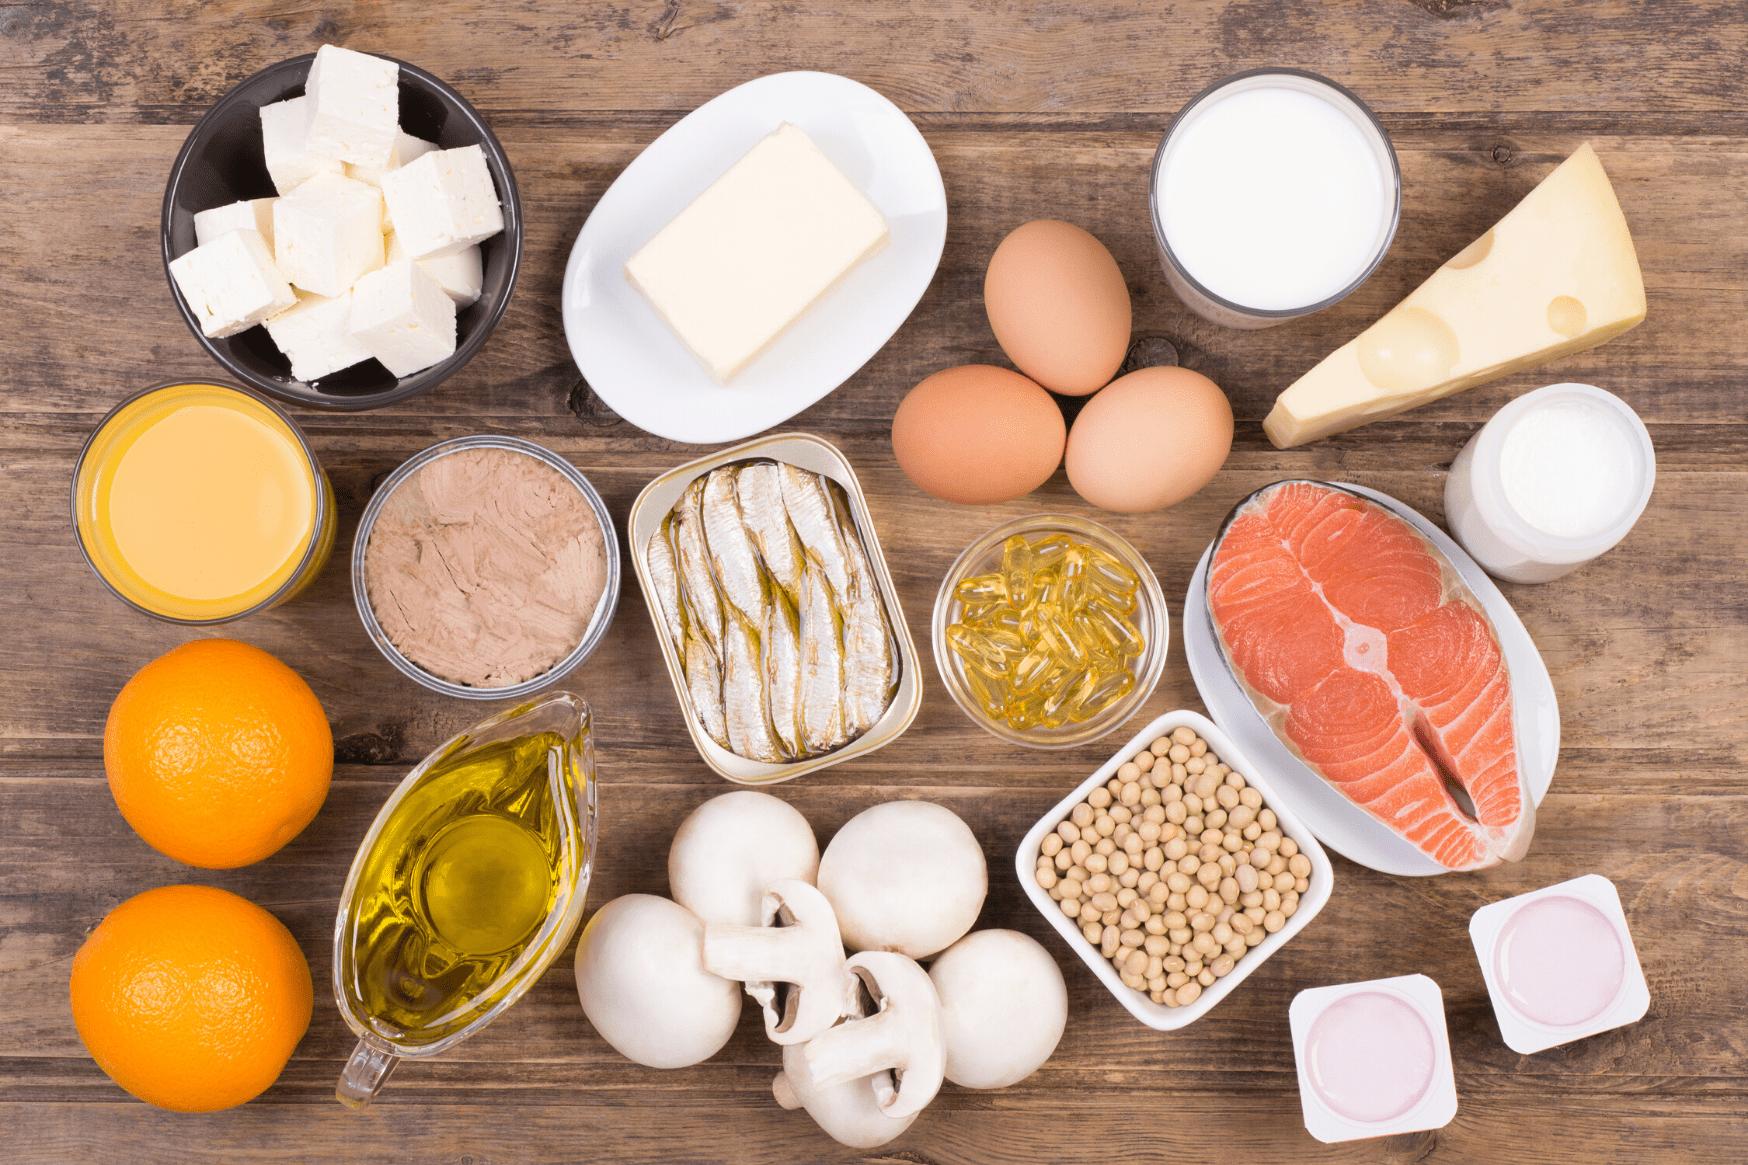 vitamine d, nutrition, cnseil, saumon, fromage, vitamine du soleil, alimentation saine, rayonnement uvb